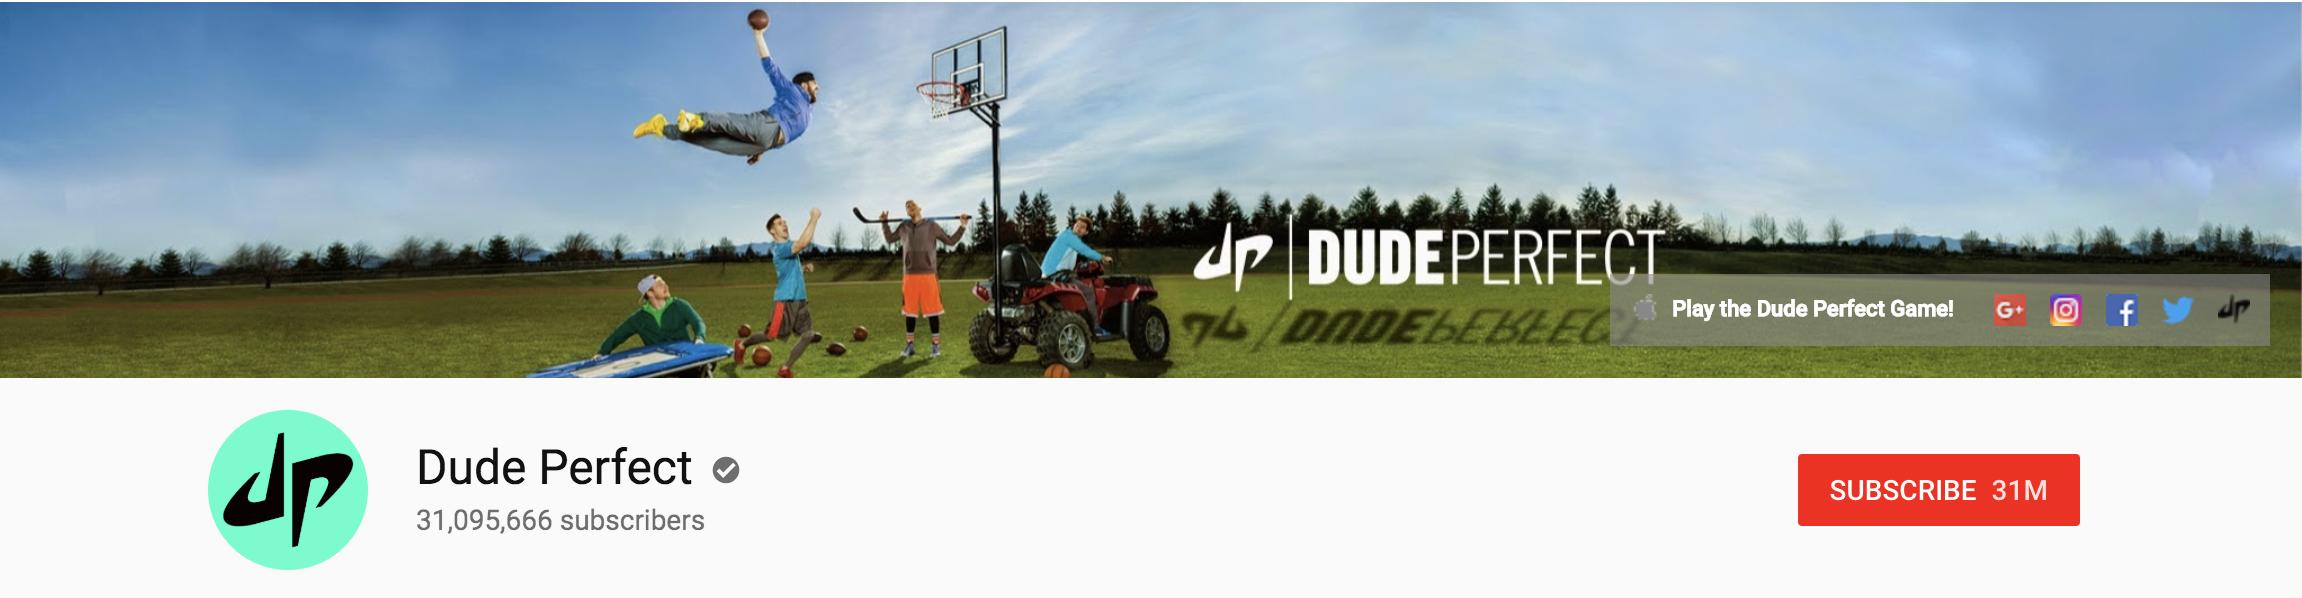 youtube-banner-idea